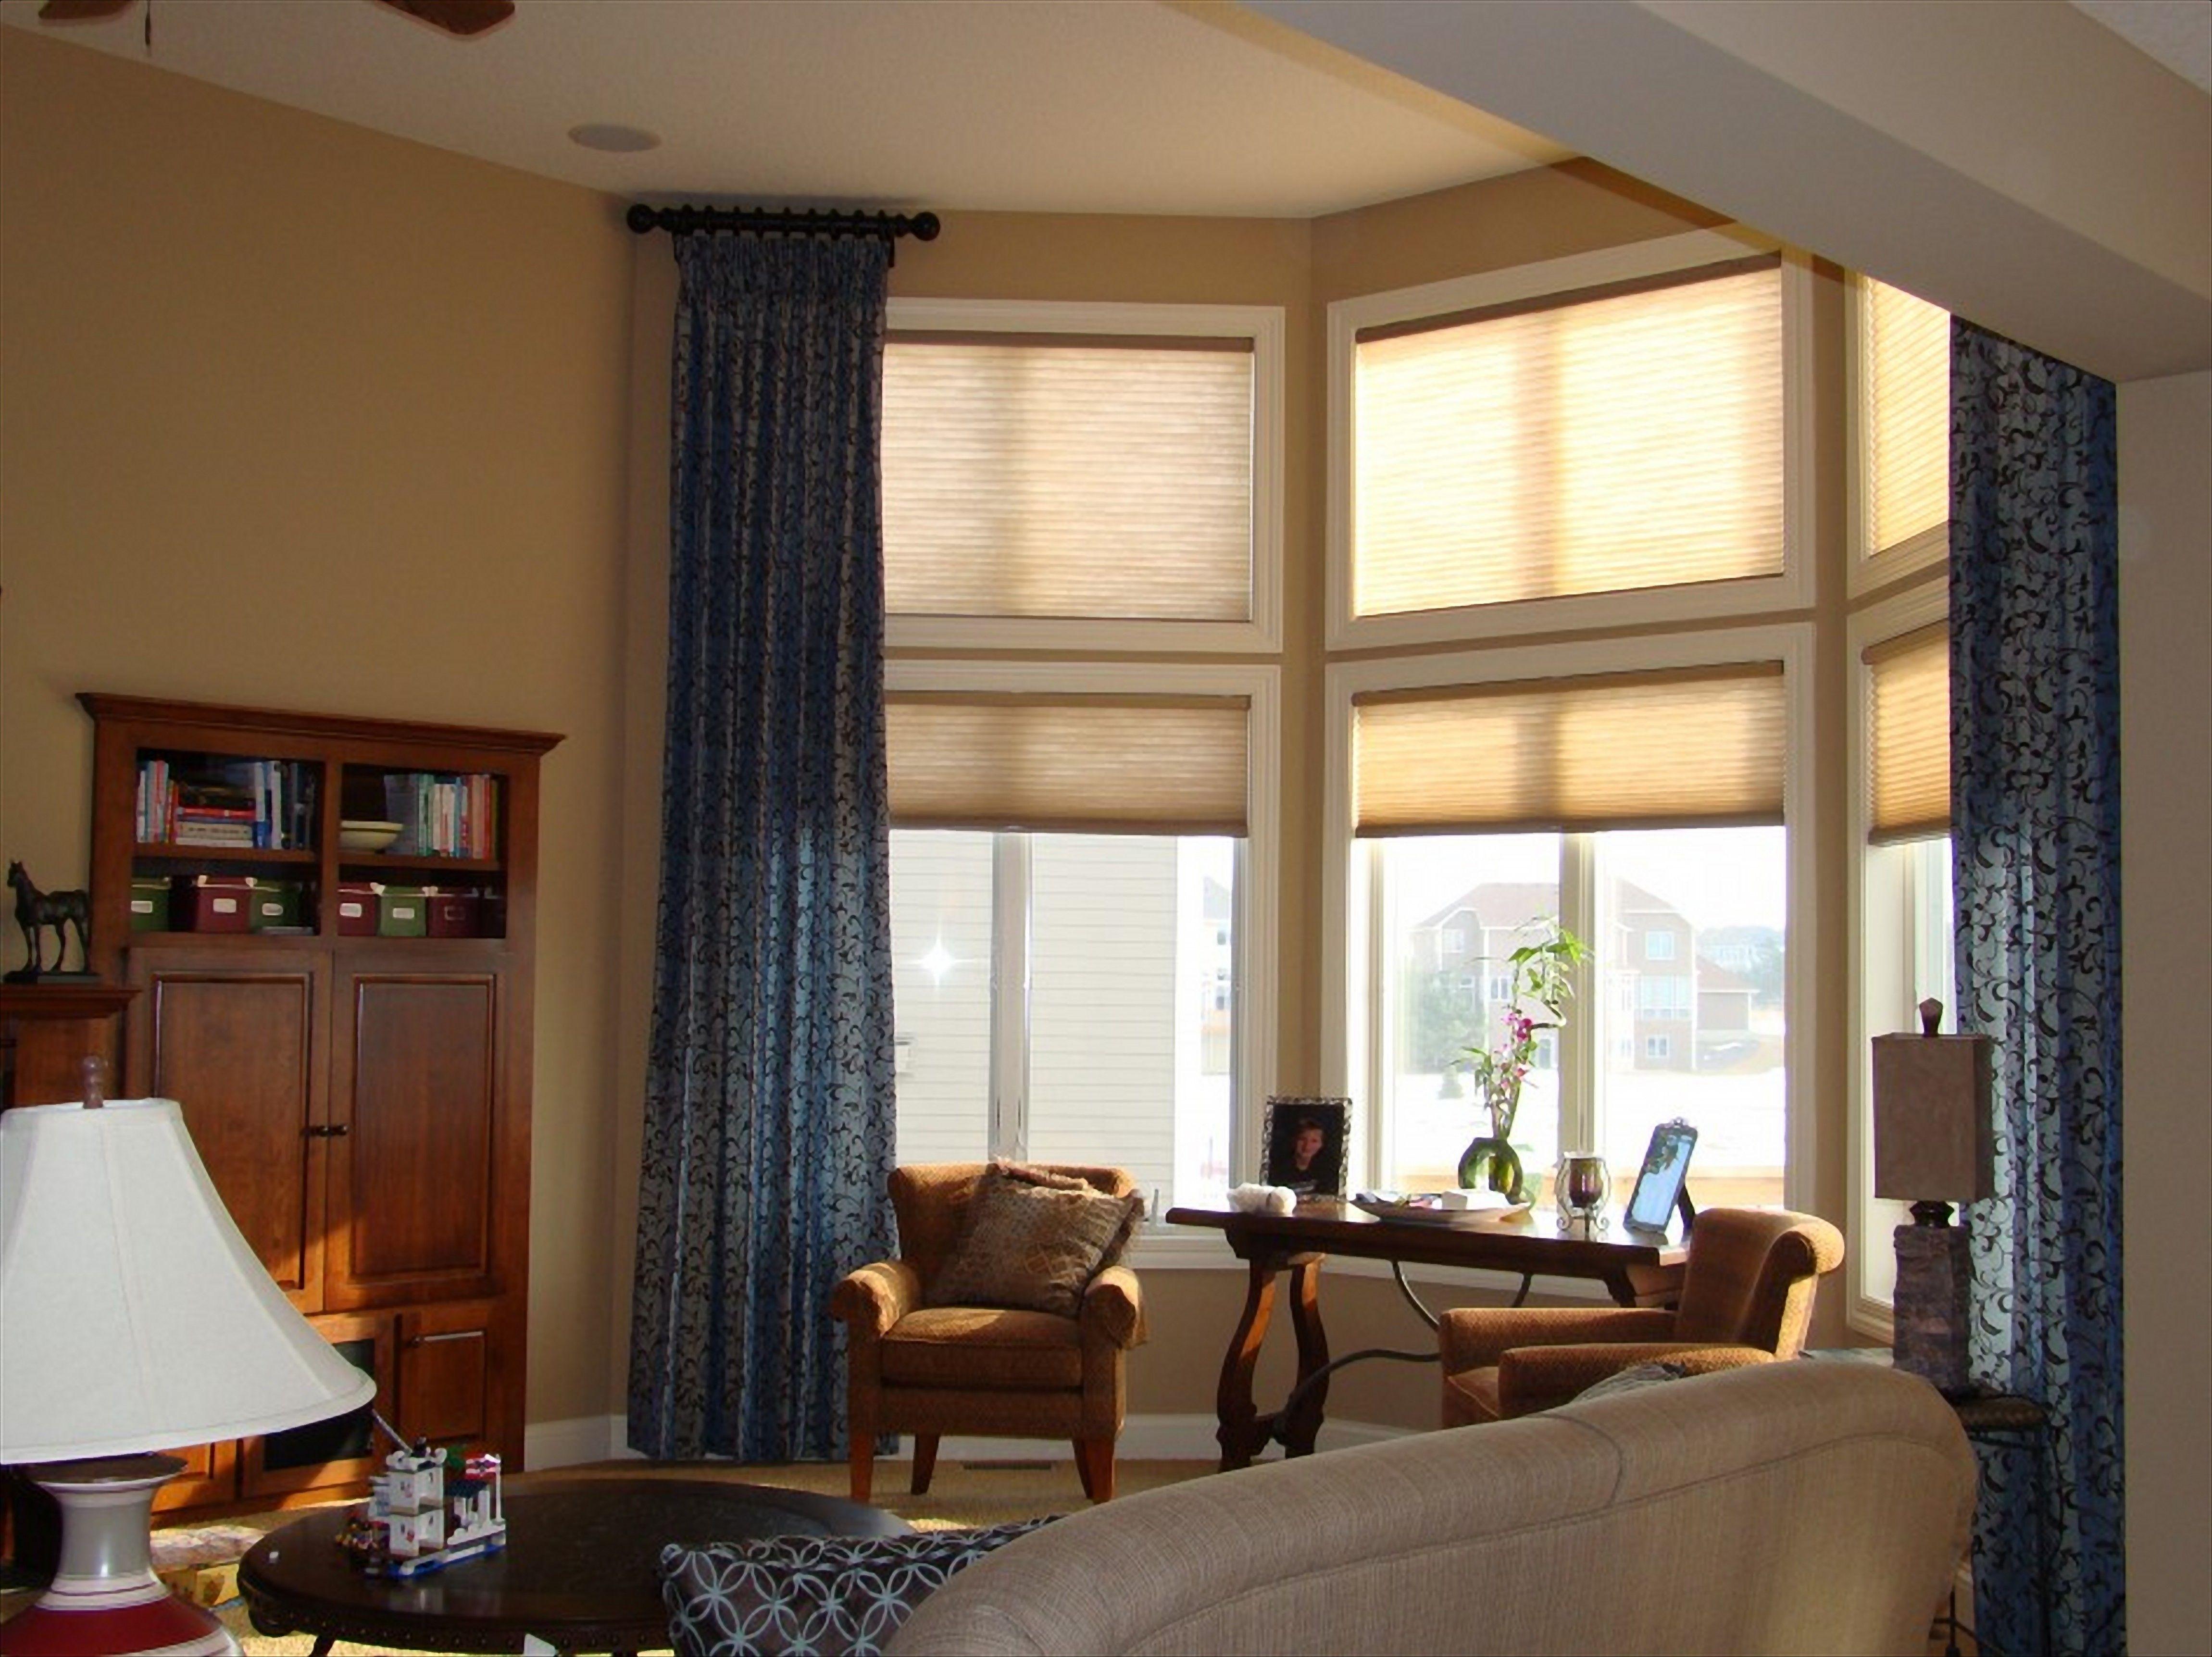 Http Krasnaya Gorka33 Ru Window Treatments Living Room Living Room Windows Curtains Living Room